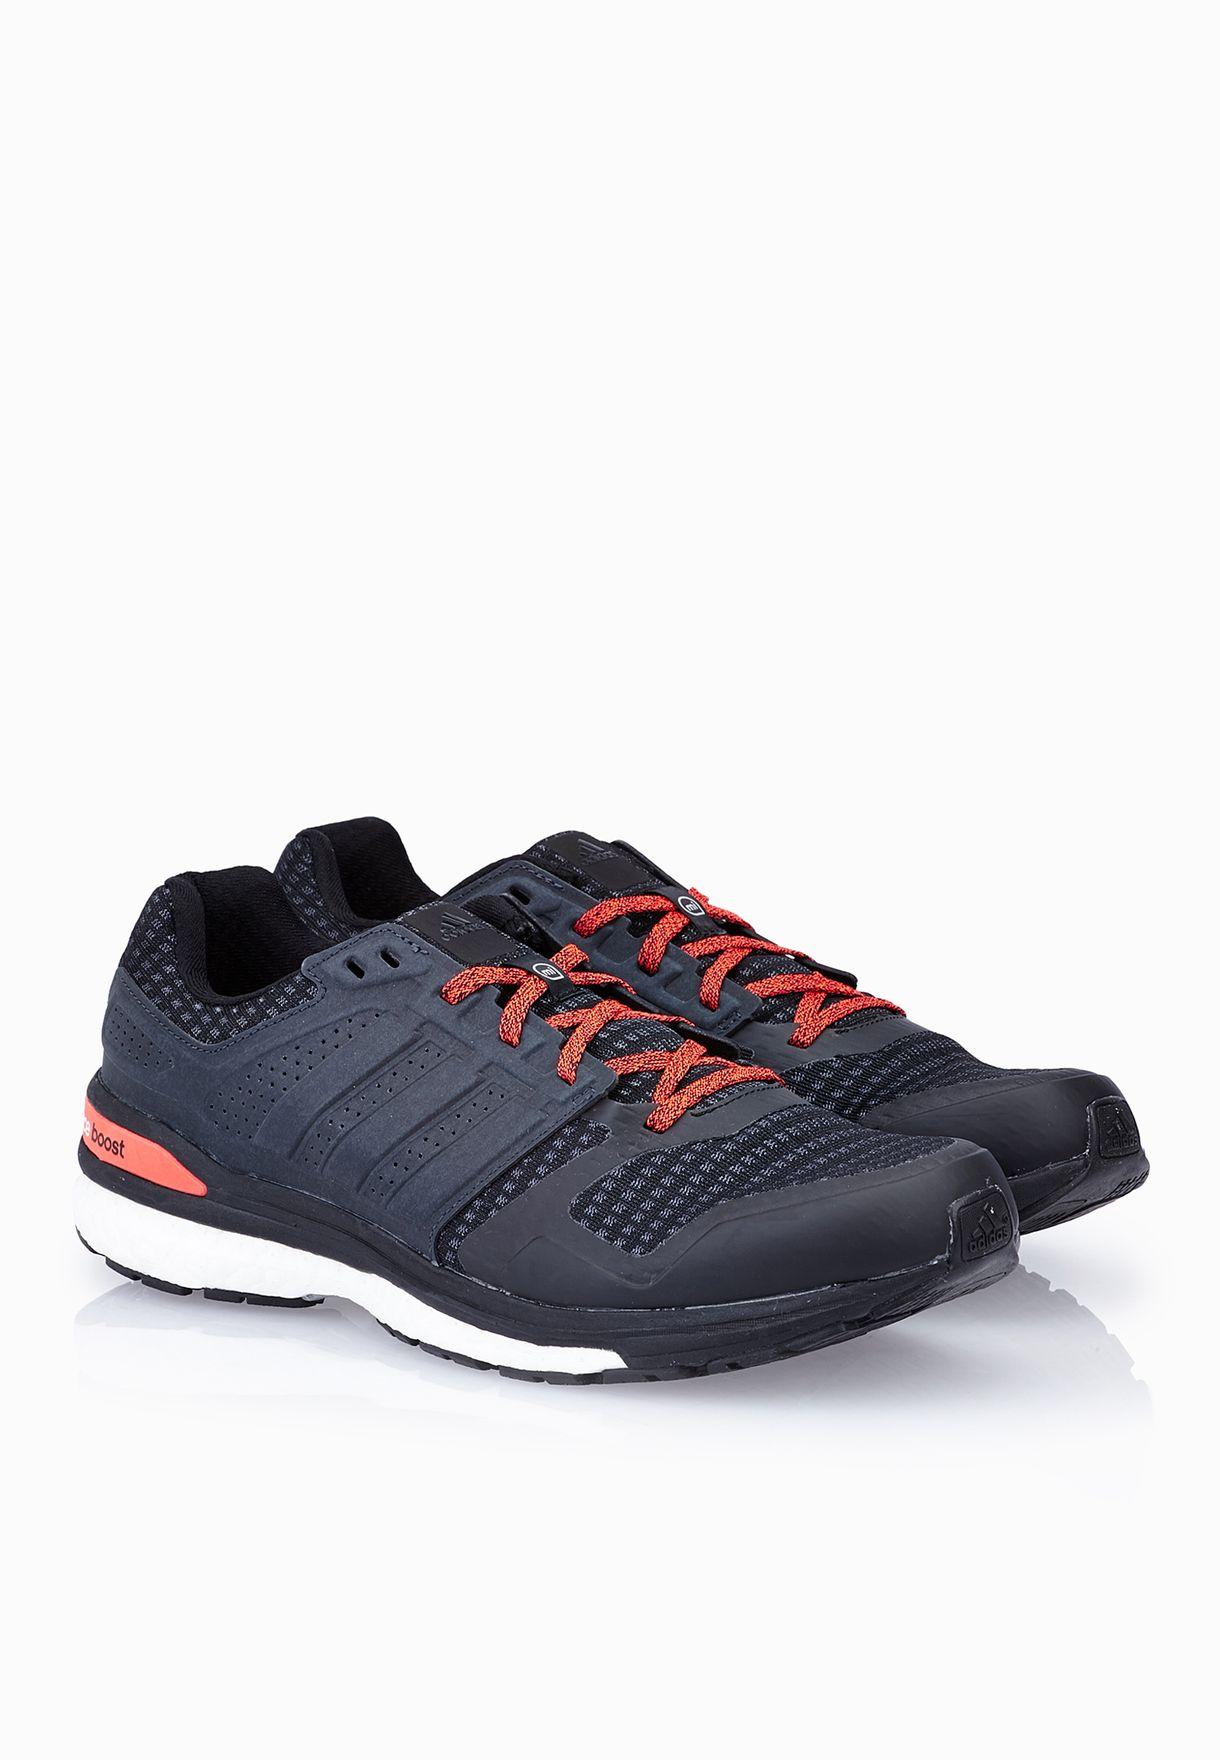 5b26c6d0168e Shop adidas black Supernova Sequence Boost 8 M B34594 for Men ...